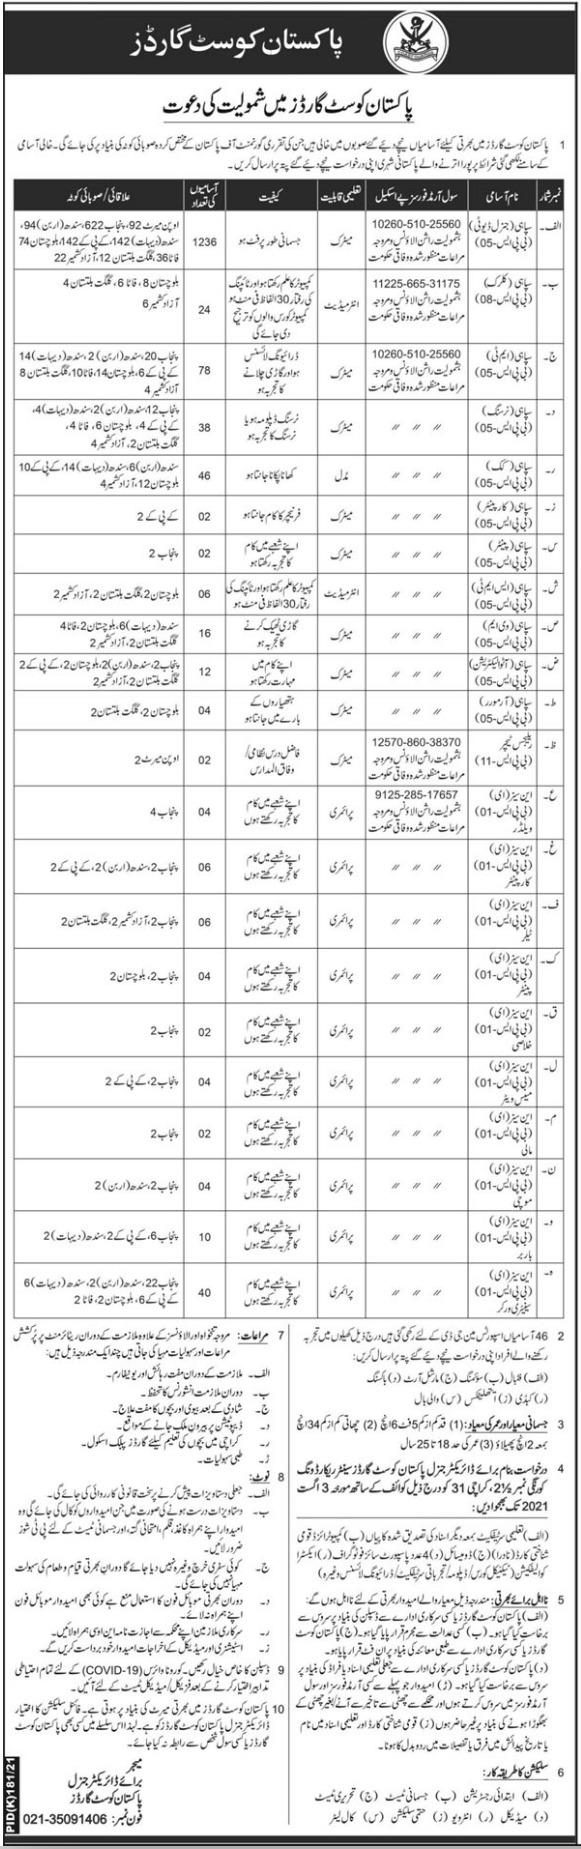 Pakistan Coast Guards Jobs 2021 In Karachi